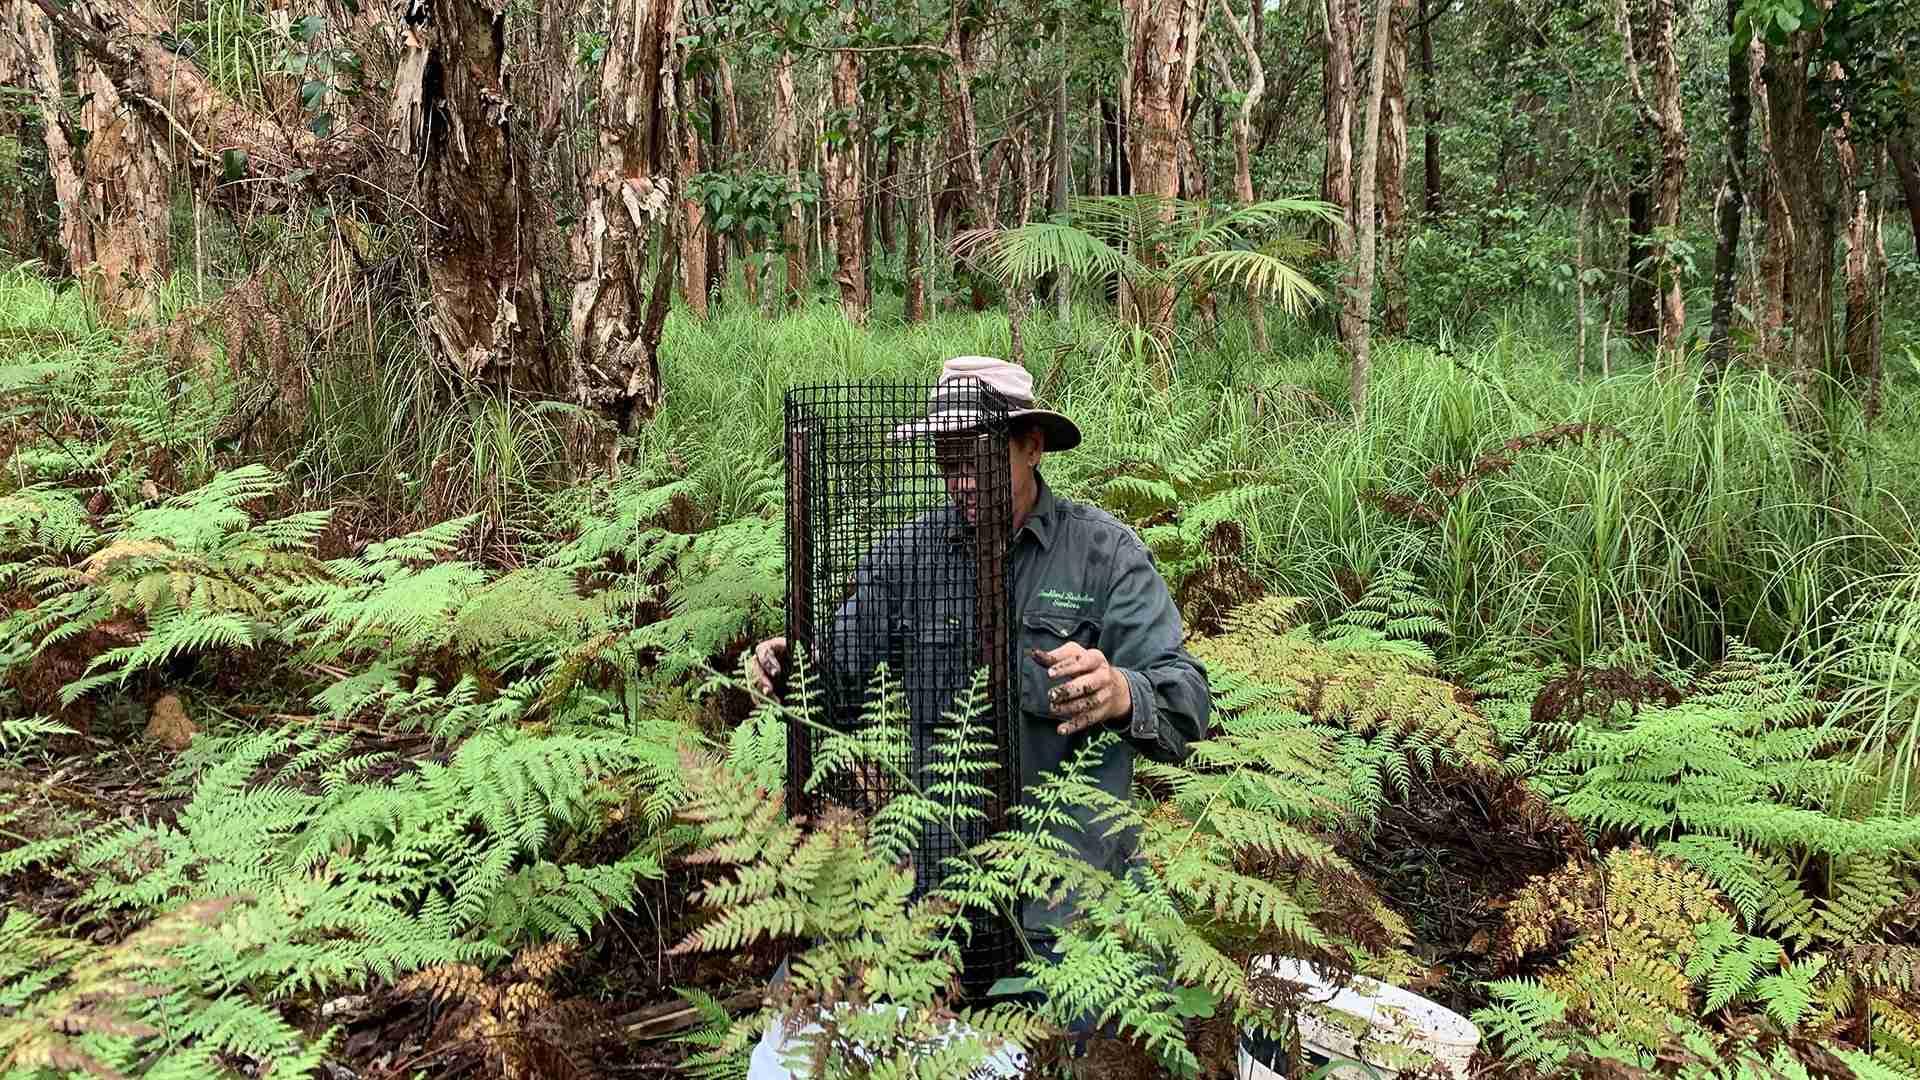 Man planting koala habitat trees in Broken Head Reserve